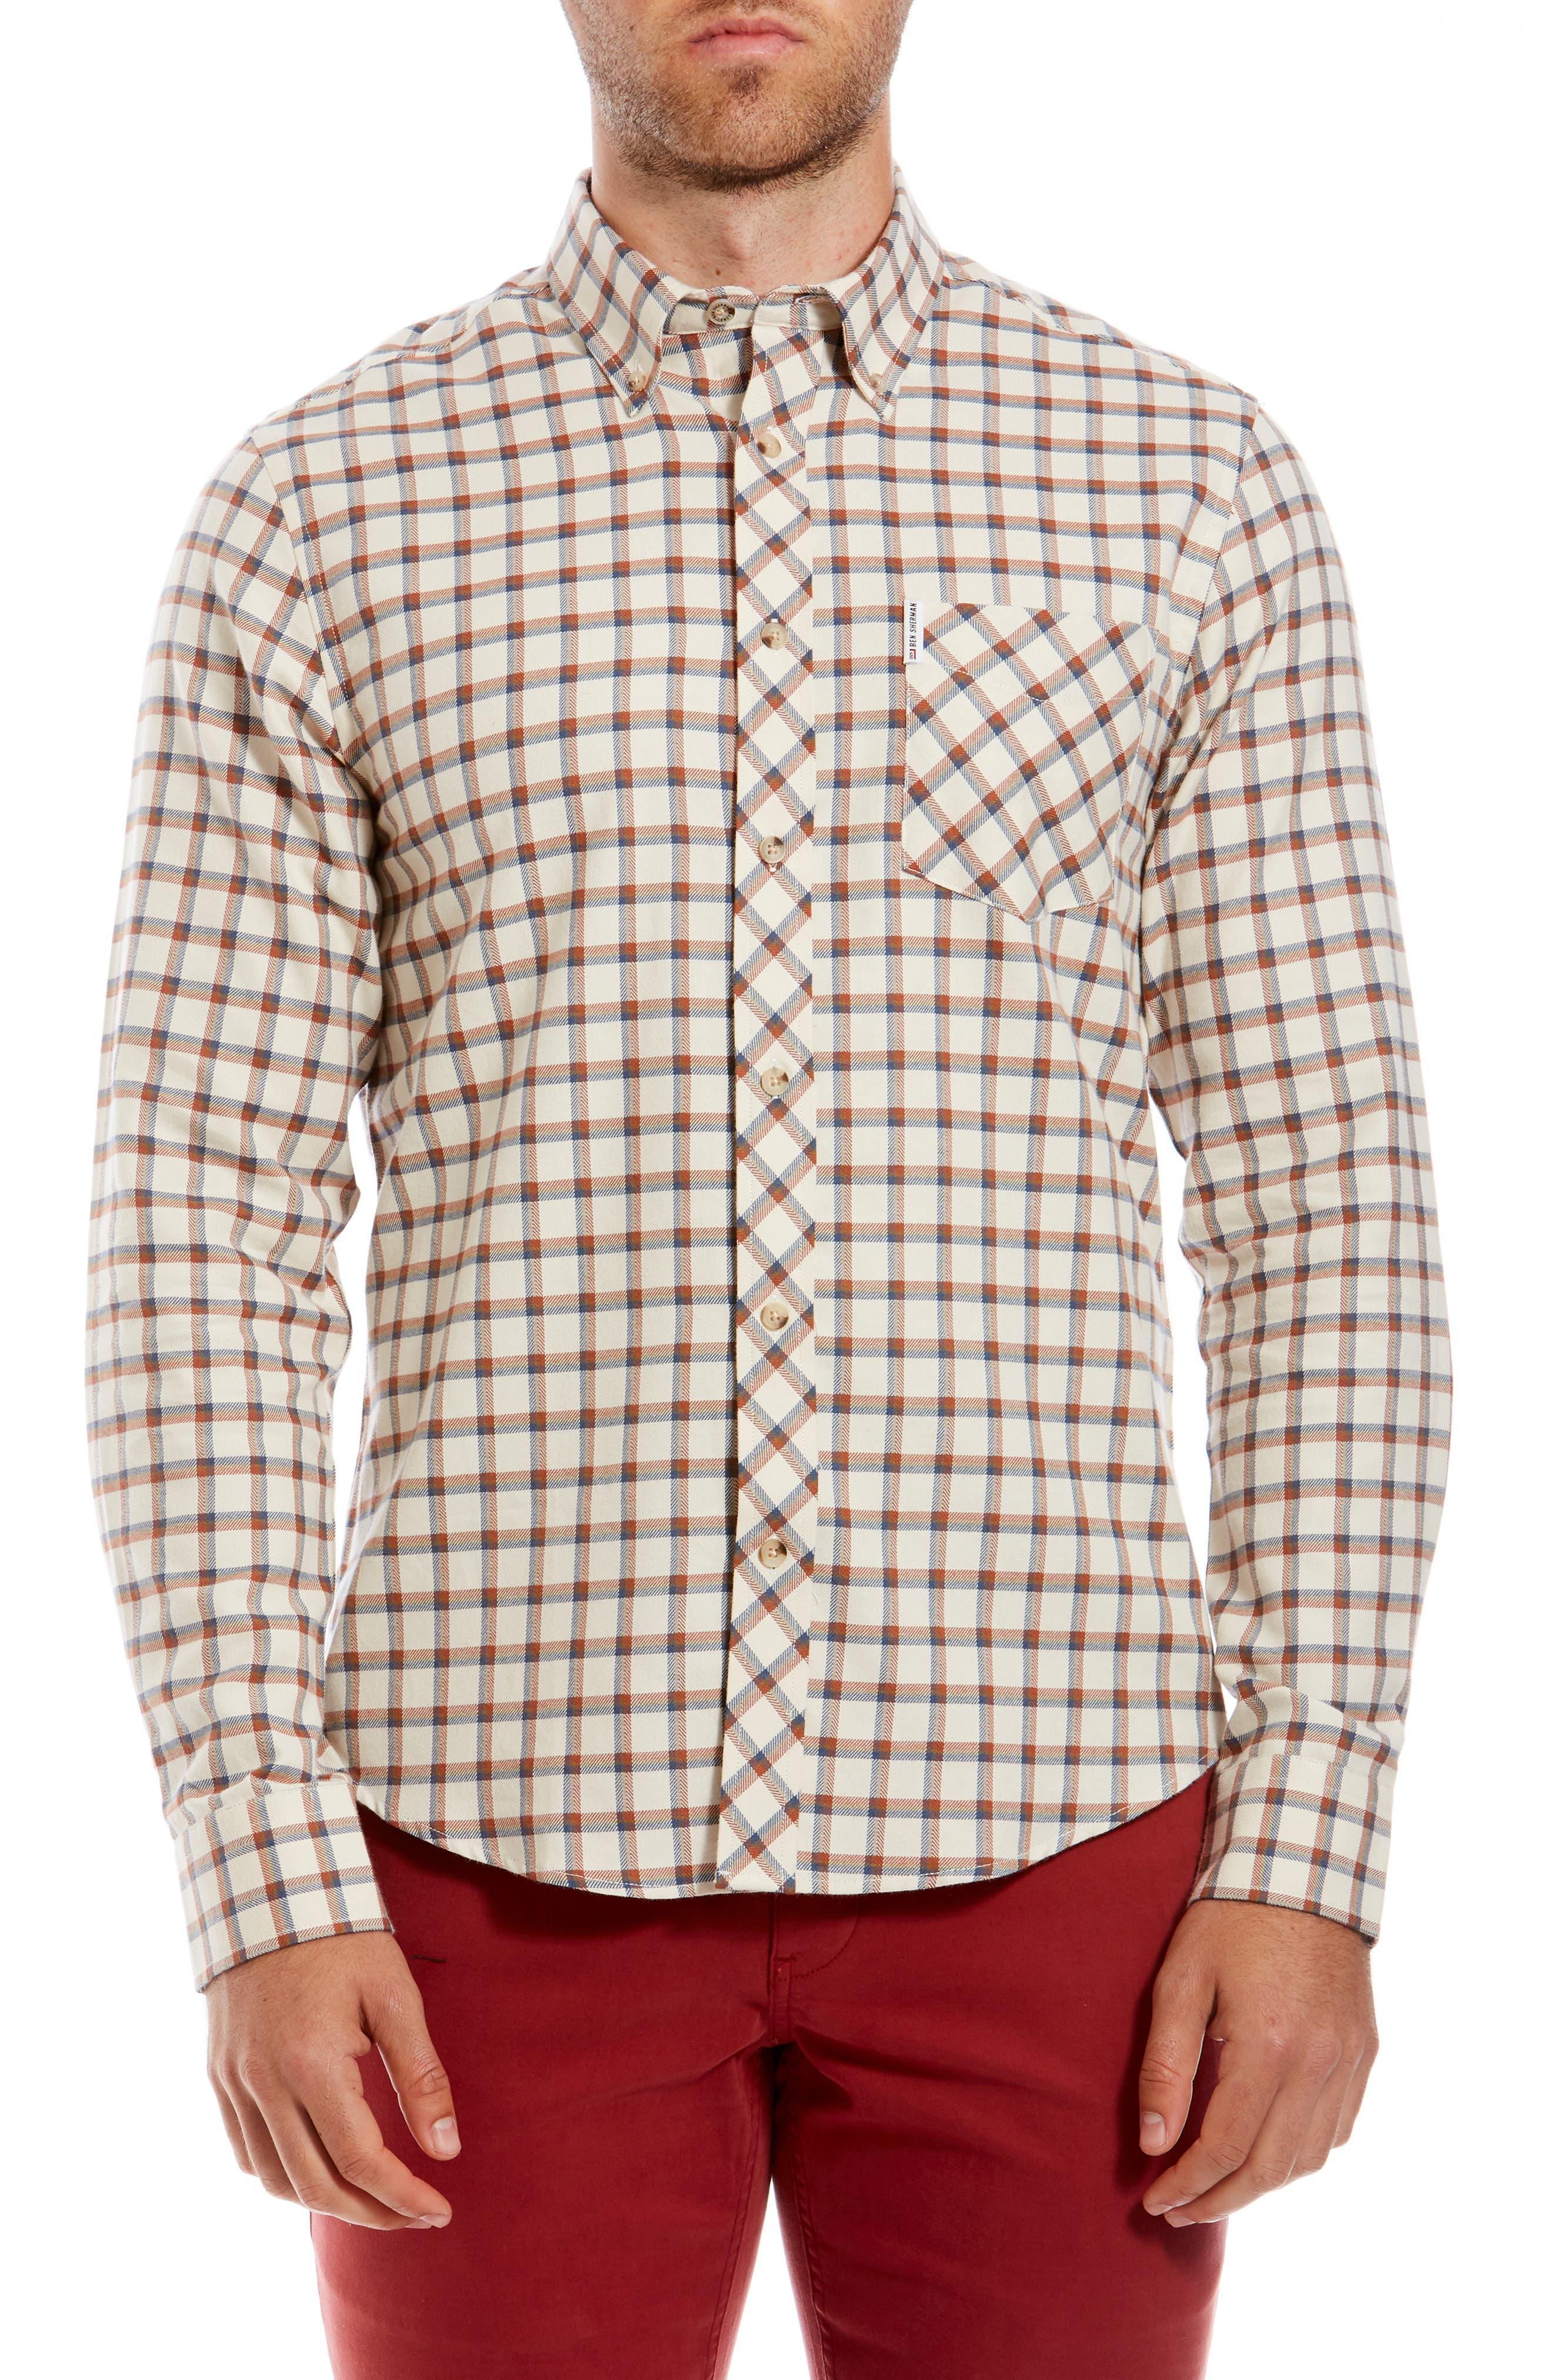 1960s Men's Clothing, 70s Men's Fashion Mens Ben Sherman Reverse Twill Trim Fit Check Sport Shirt $79.00 AT vintagedancer.com